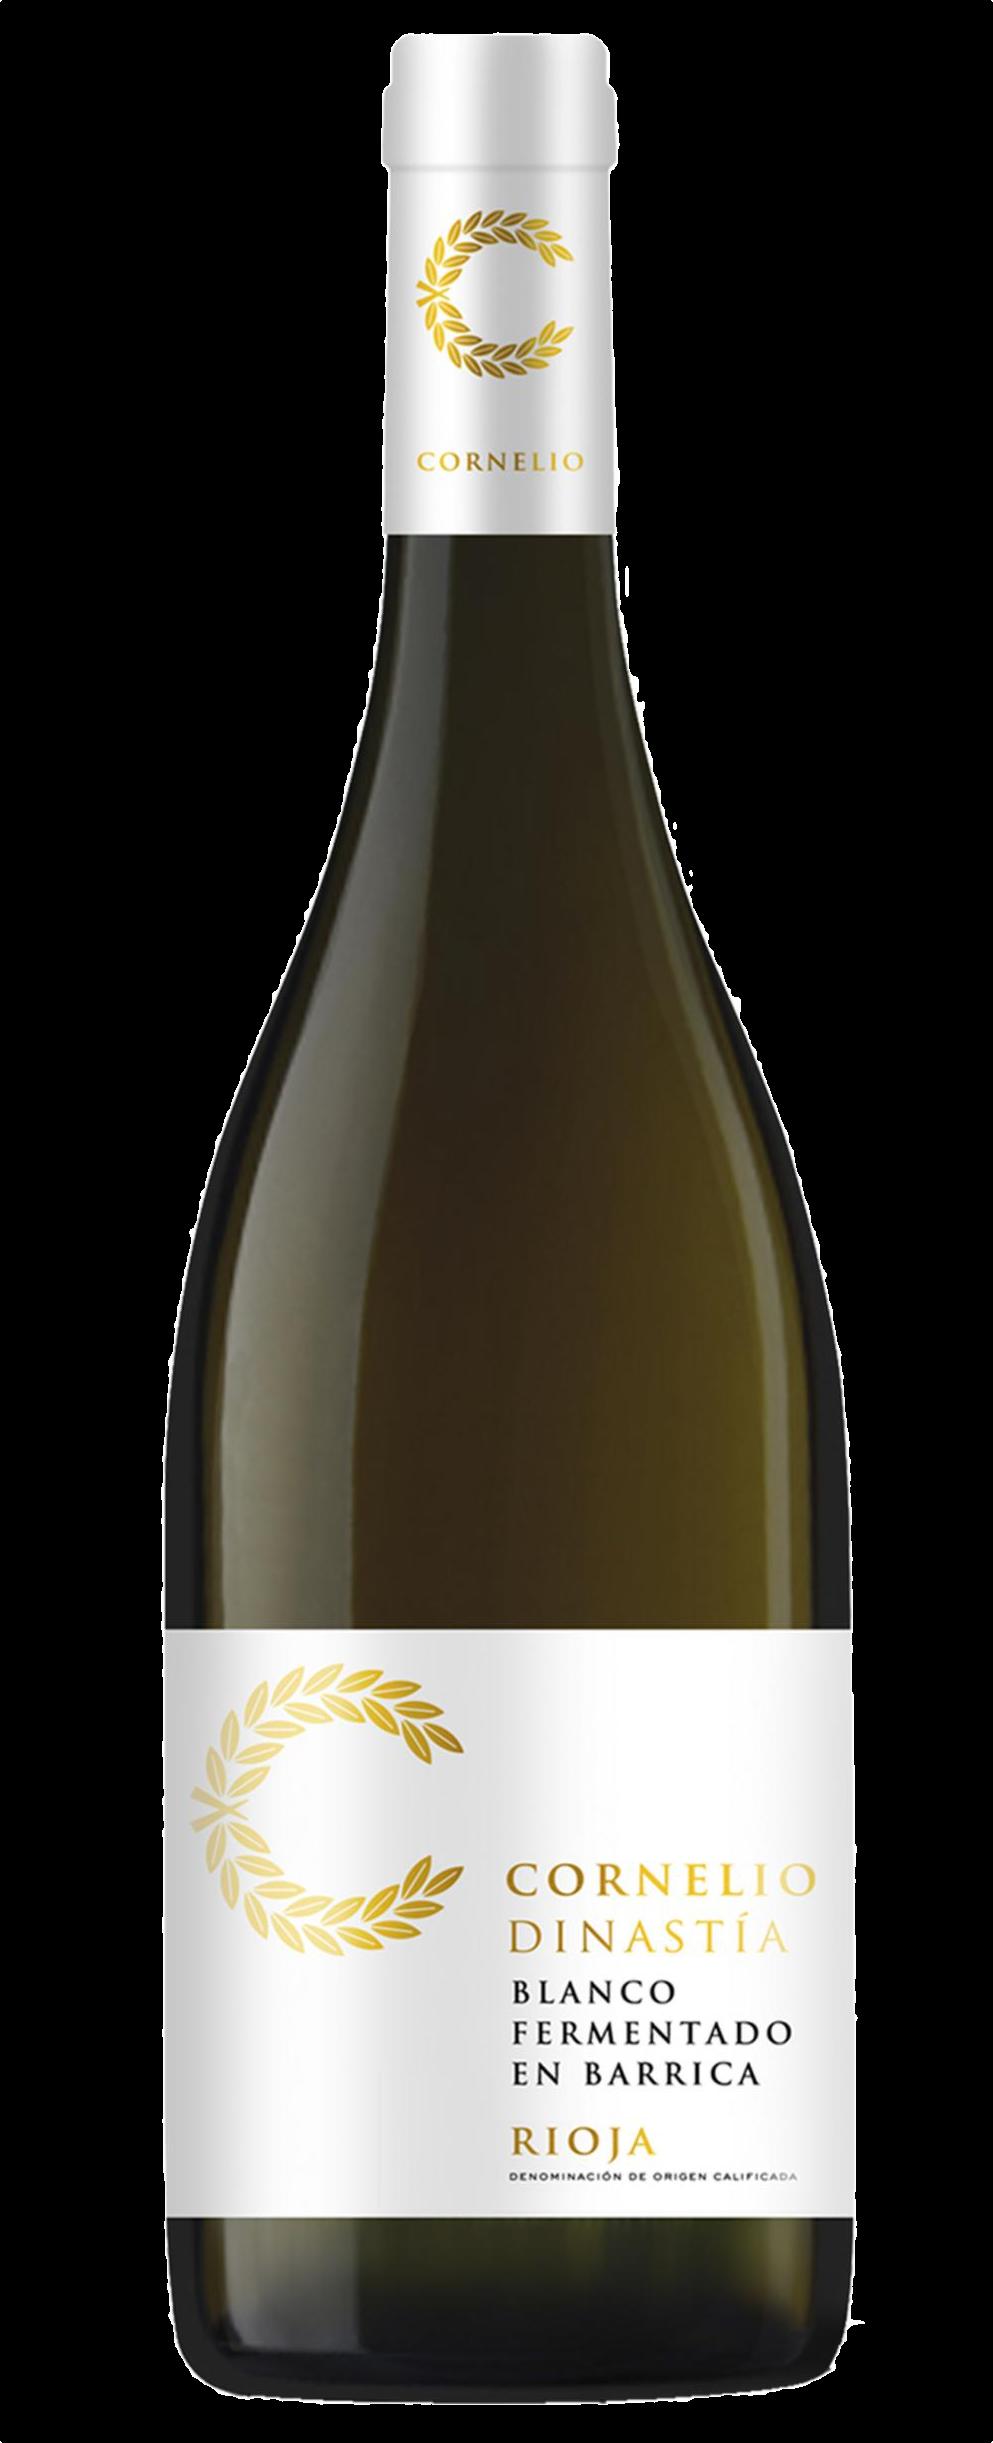 Blanco Cornelio Dinastia Fermentado En Barrica Rioja D.O.Ca. 2017